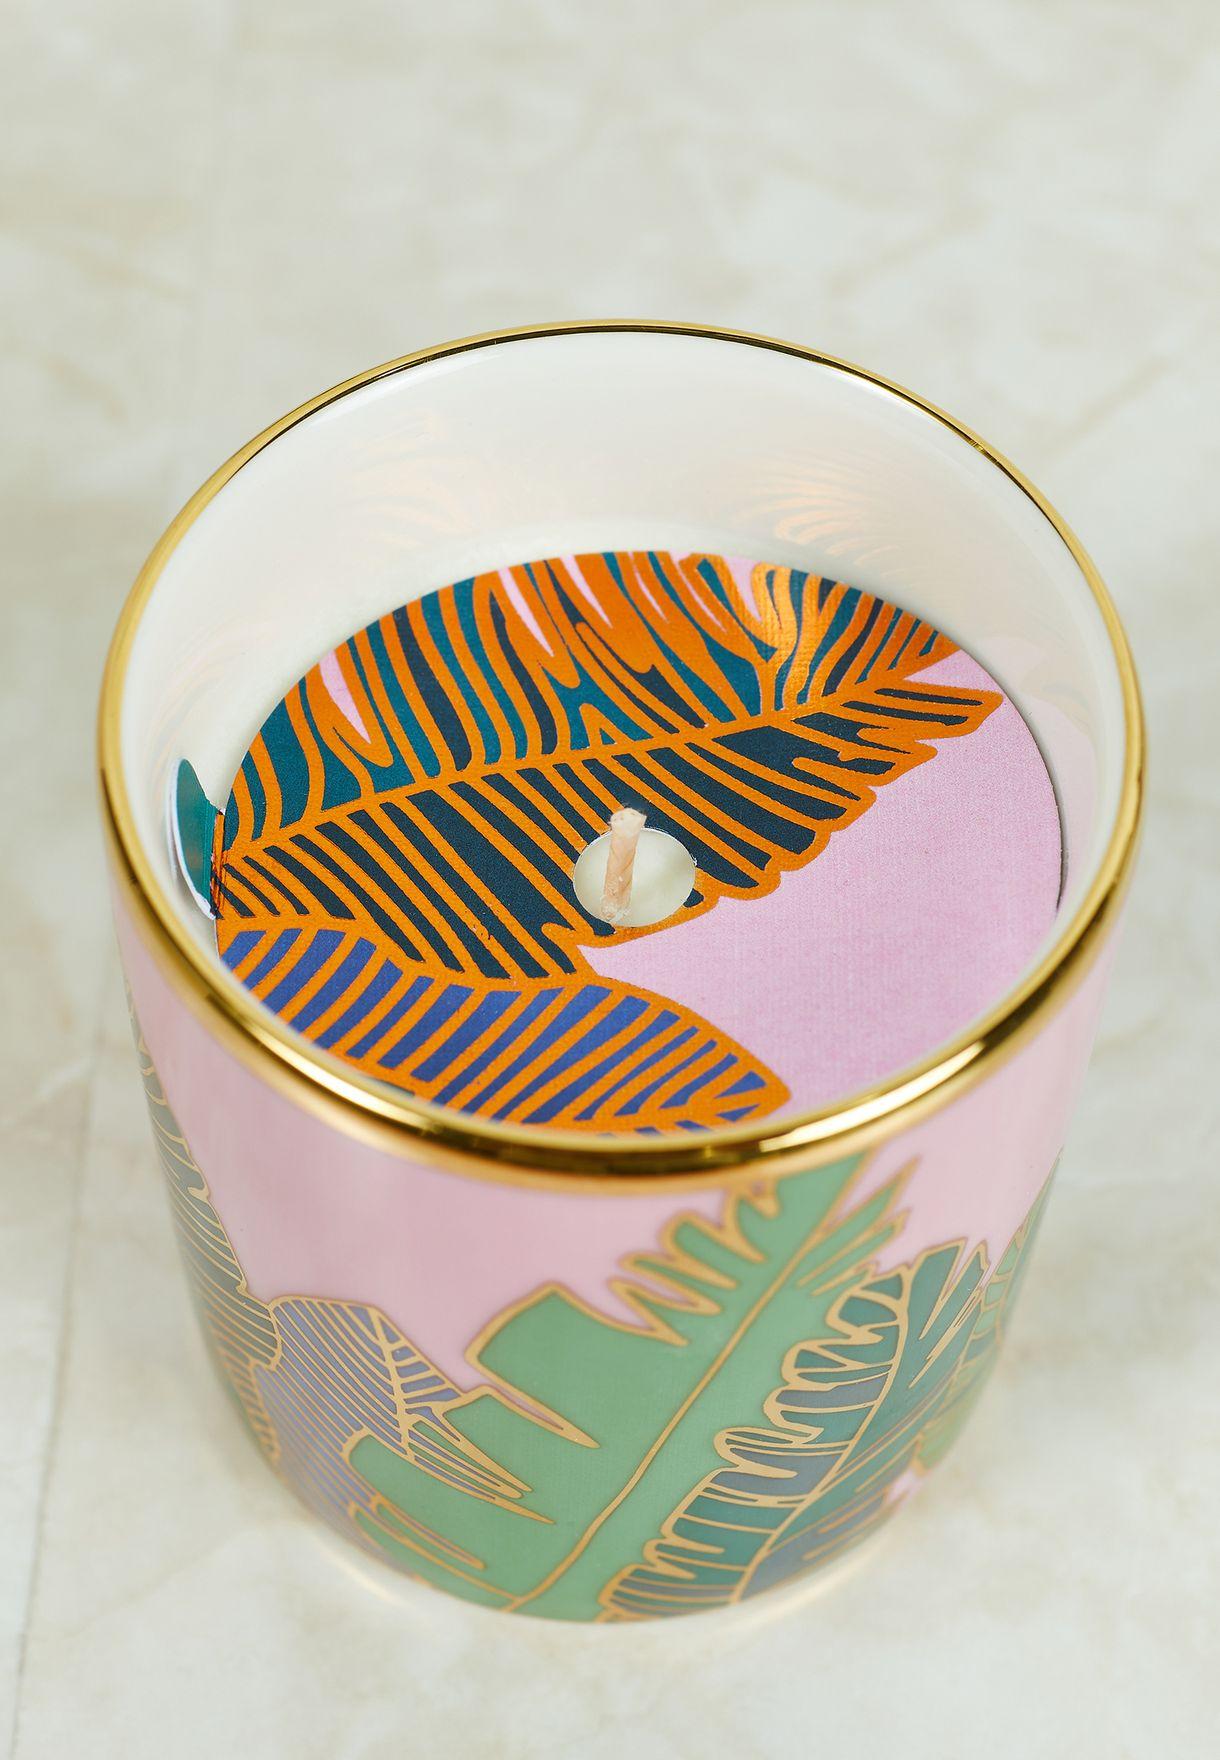 Mandarin Babylon Porcelain Candle 200ml